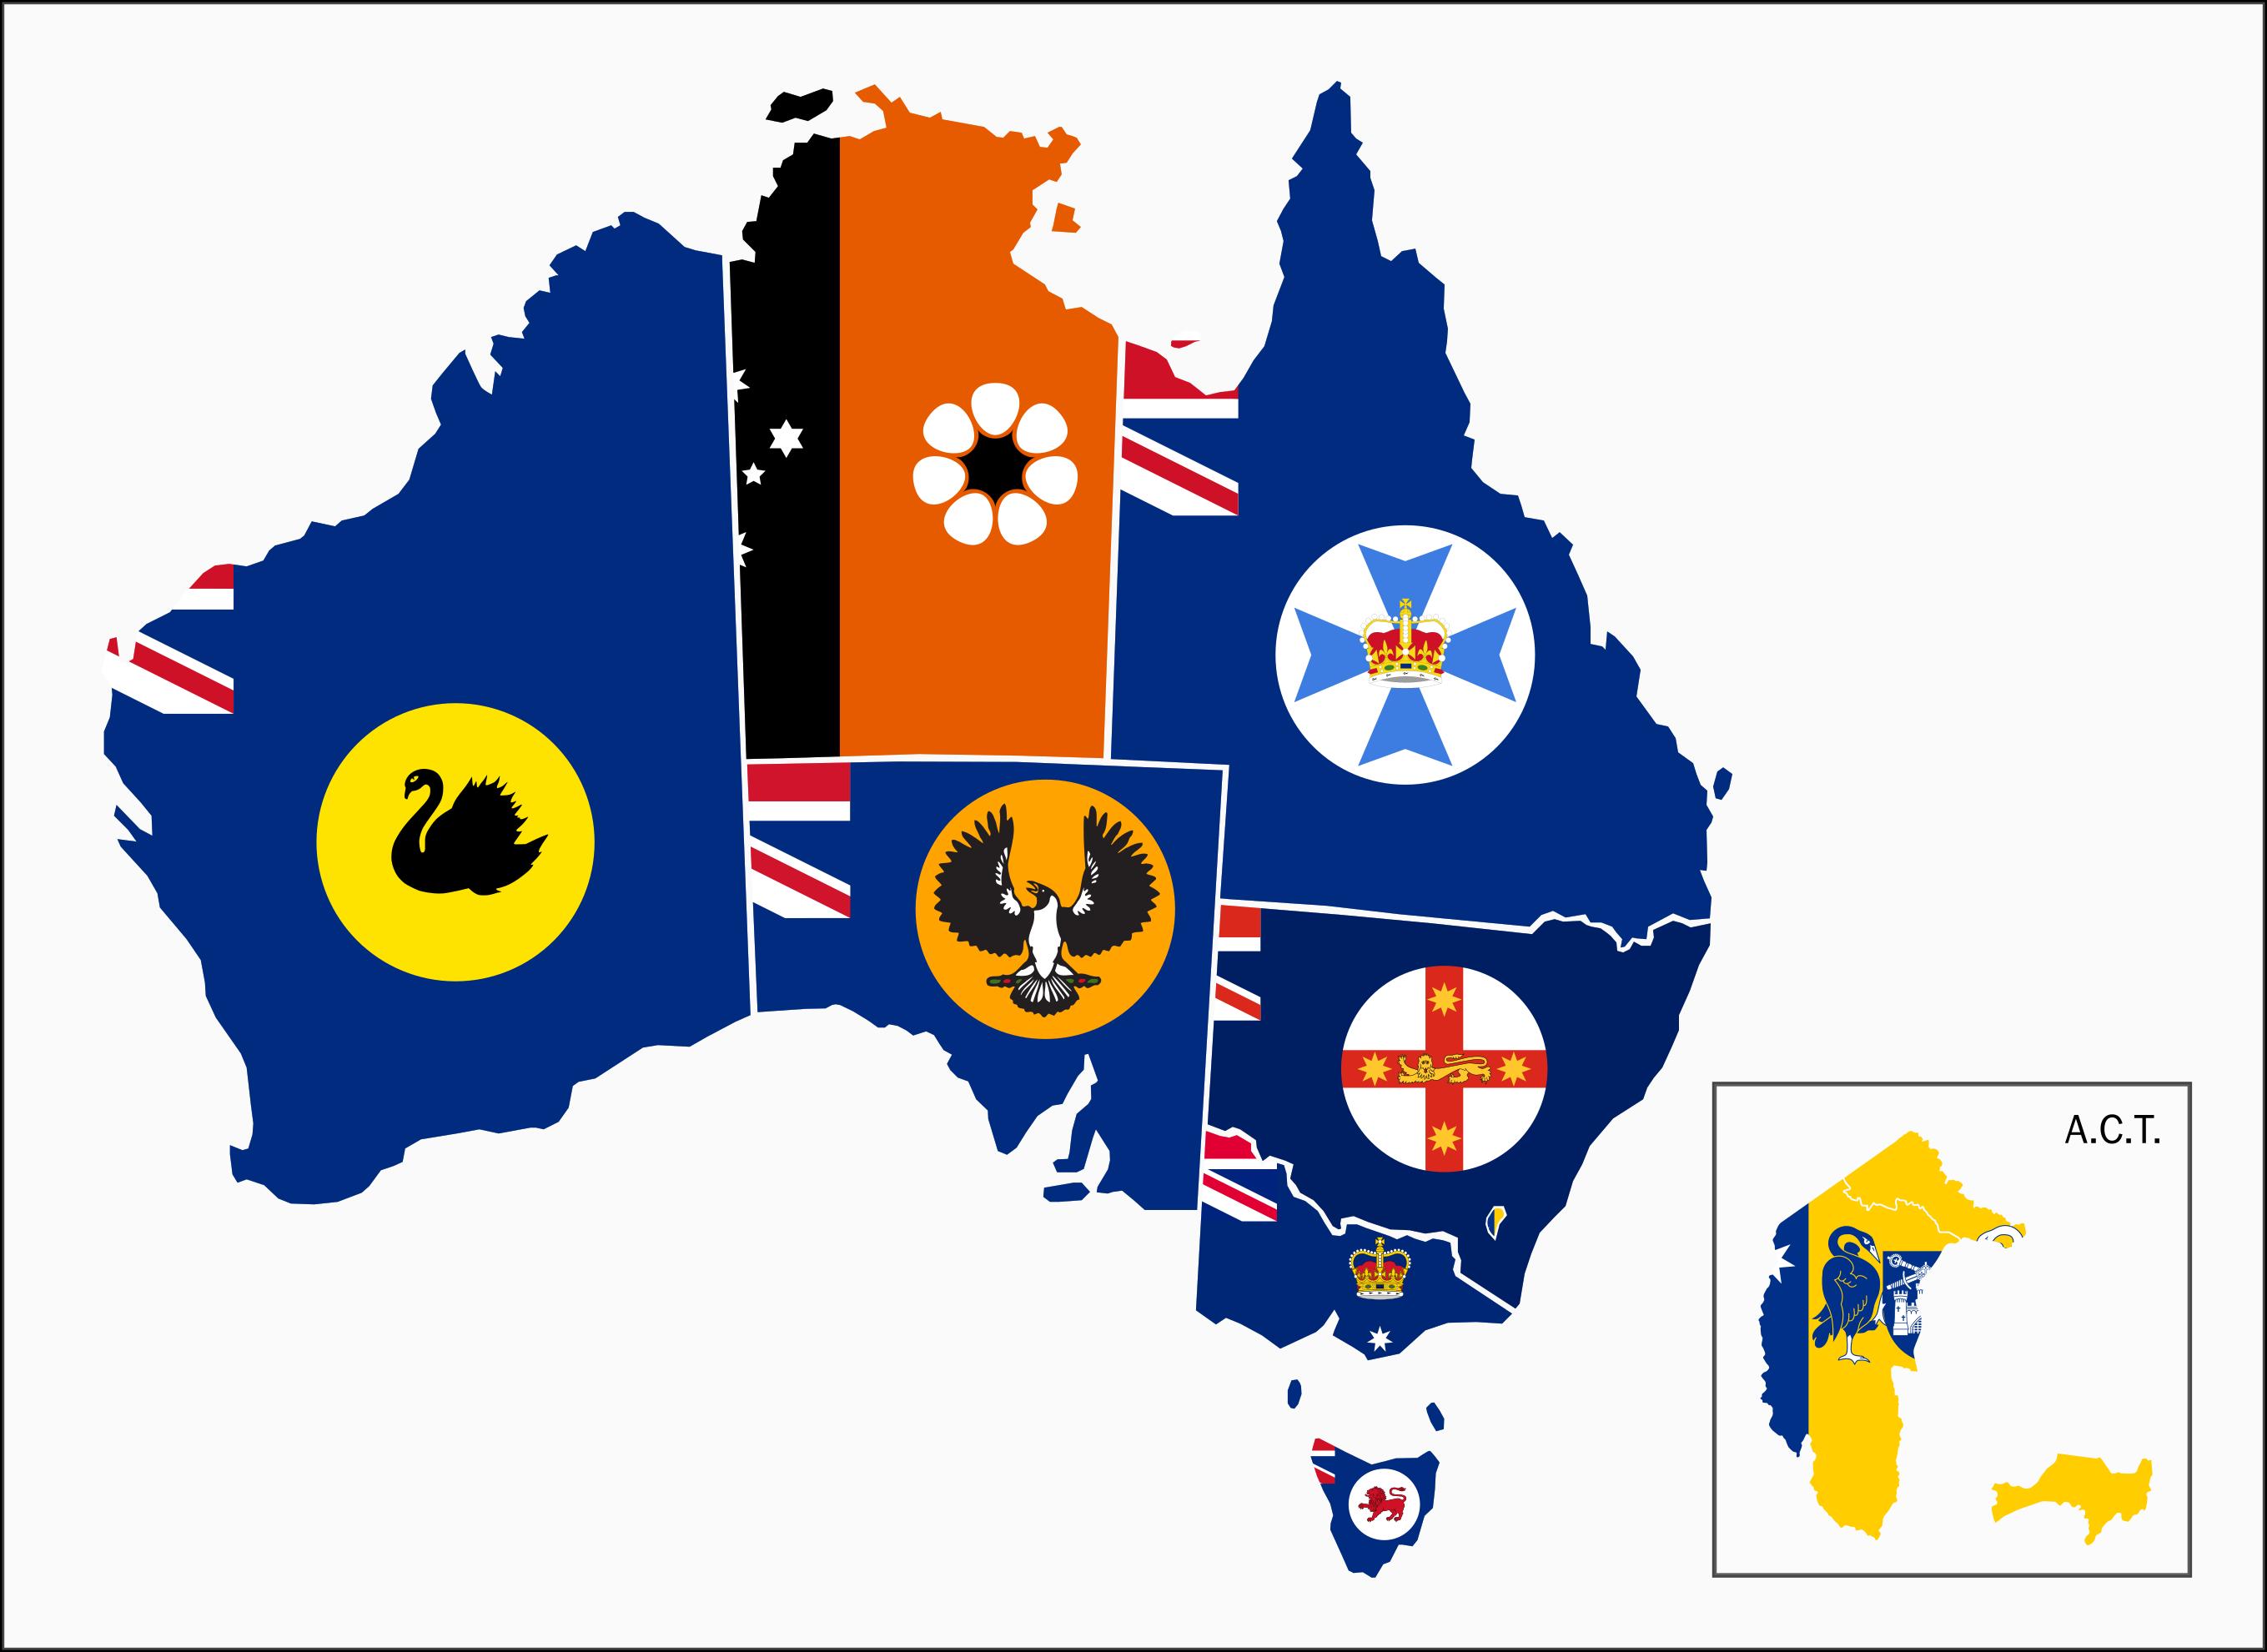 Pin on Australia Australia Physical Features Map Flag on australia physical geography, australia places map, australia lakes on map, australia geographical features, australia on a map, australia environment map, australia climate, new zealand and australia physical map, australia physical landforms, australia religion map, australia cities map, australia language map, austria physical map, southern alps australia map, australia trade map, australia physical and political map, australia land features, australia map with latitude and longitude, australia shape map, australia rivers map,